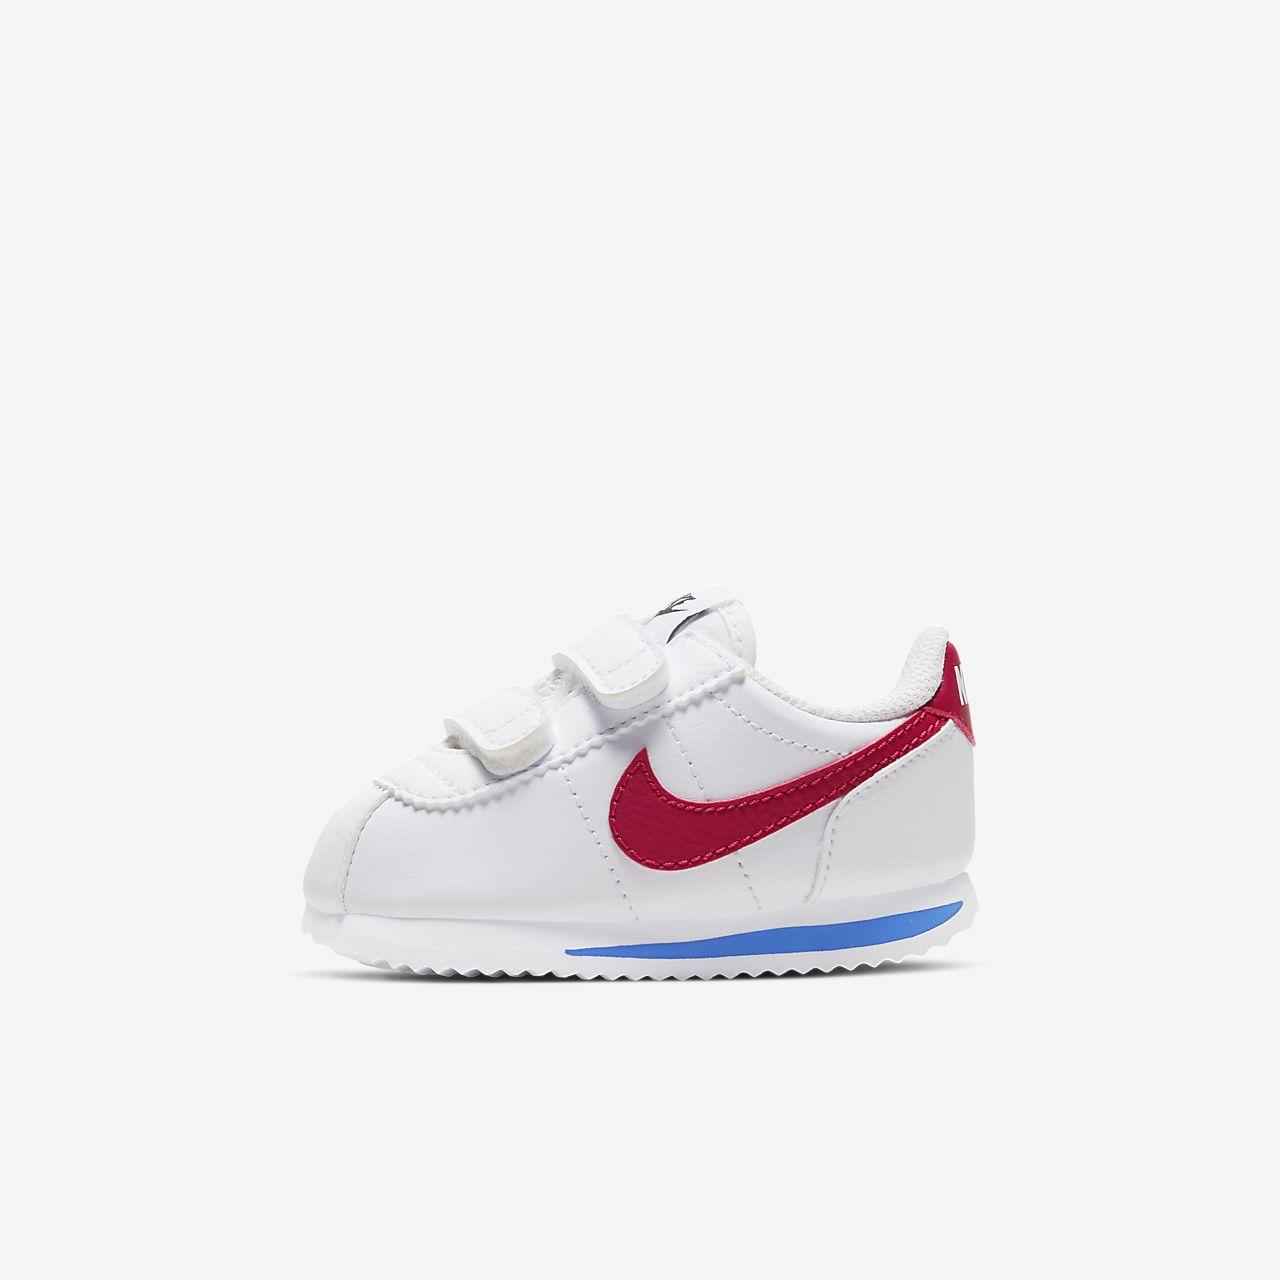 size 40 85d6d ccccd ... Sko Nike Cortez Basic SL för baby små barn